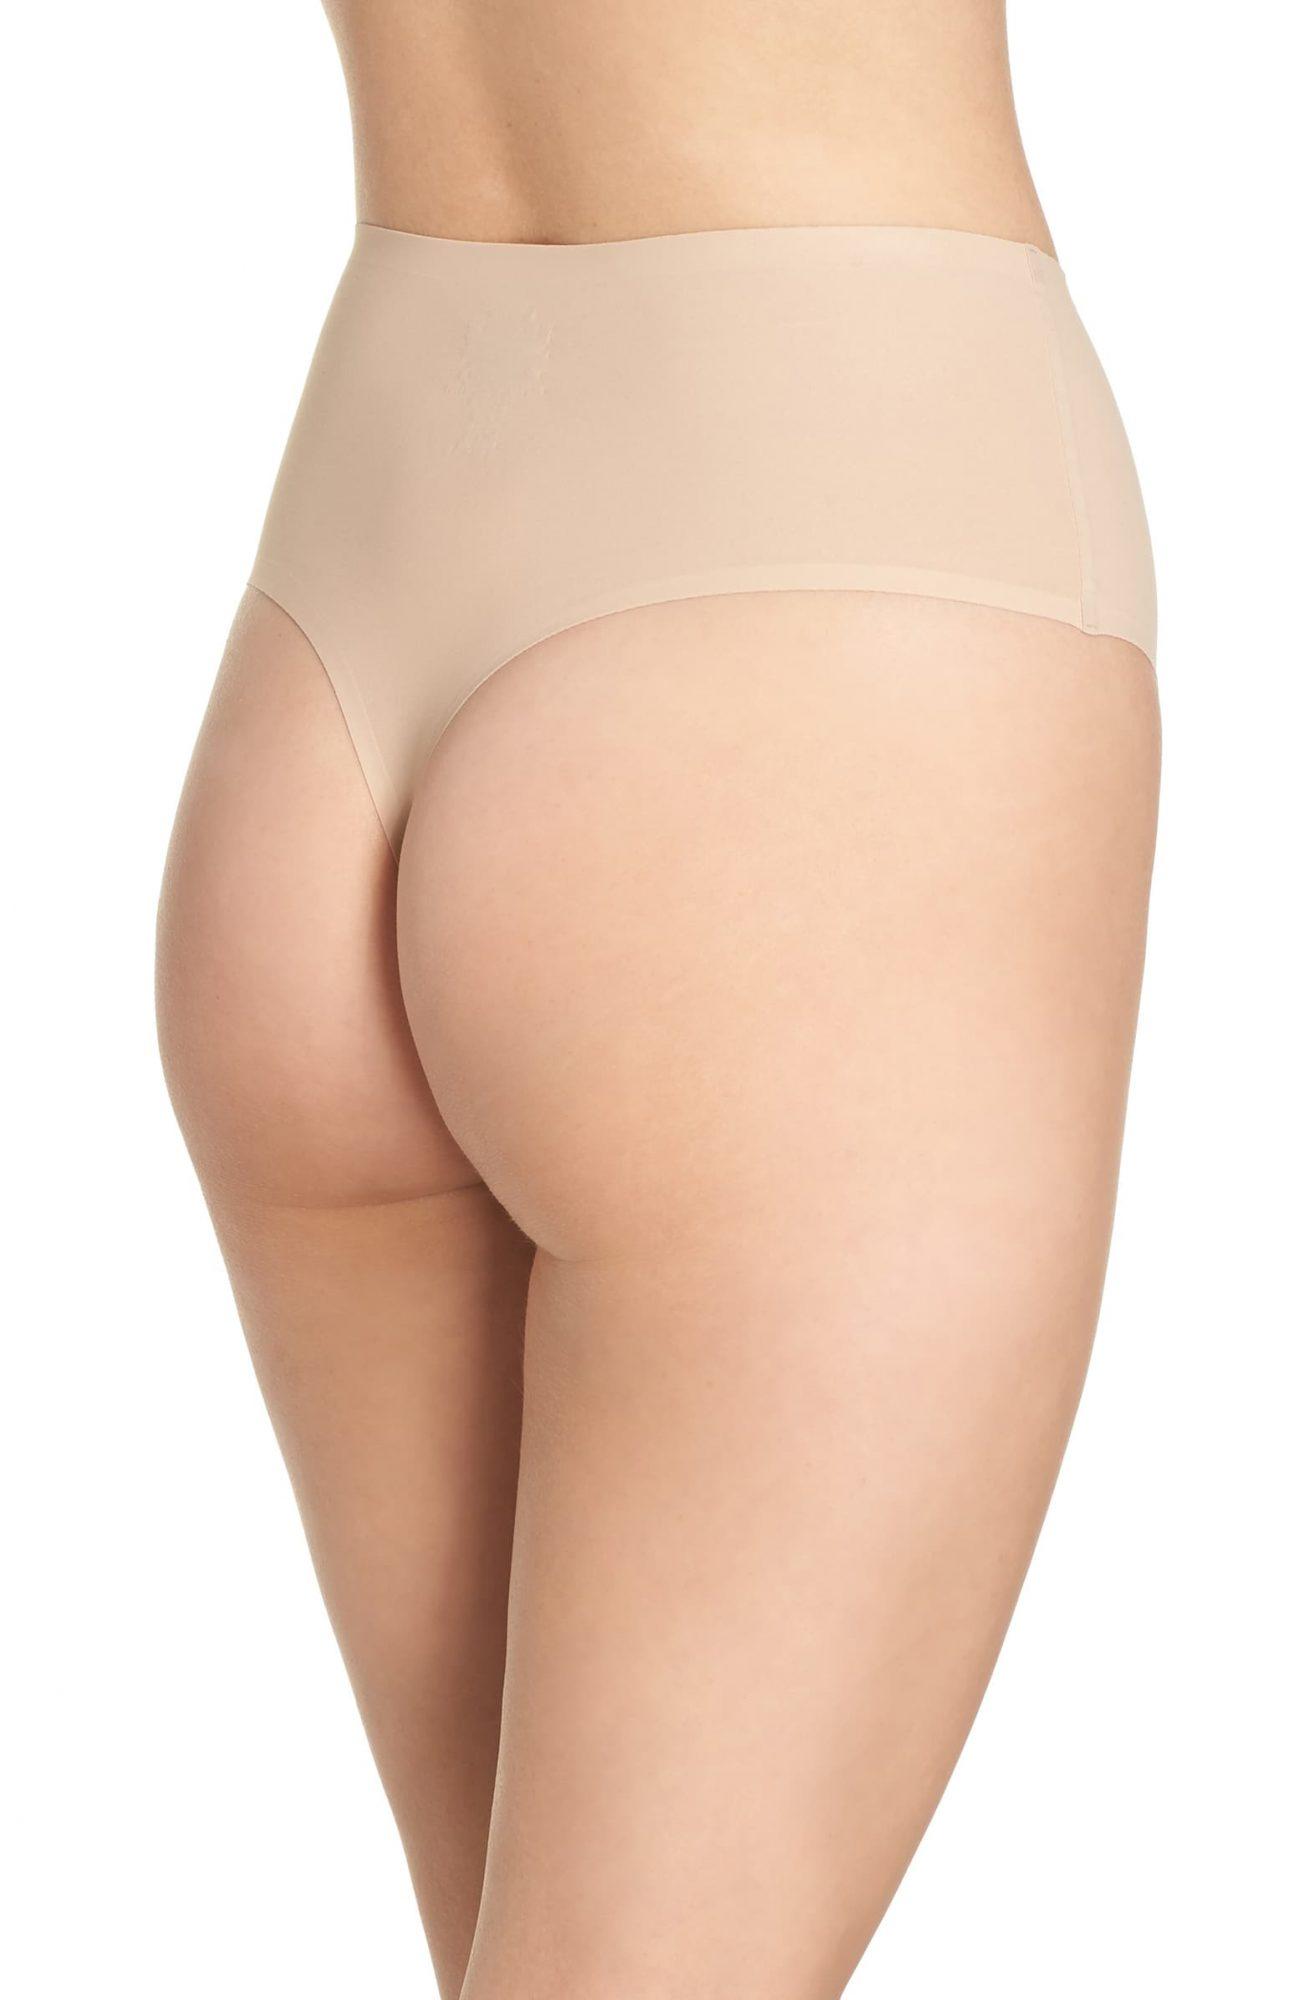 chantelle lingerie Soft Stretch Seamless Retro Thong